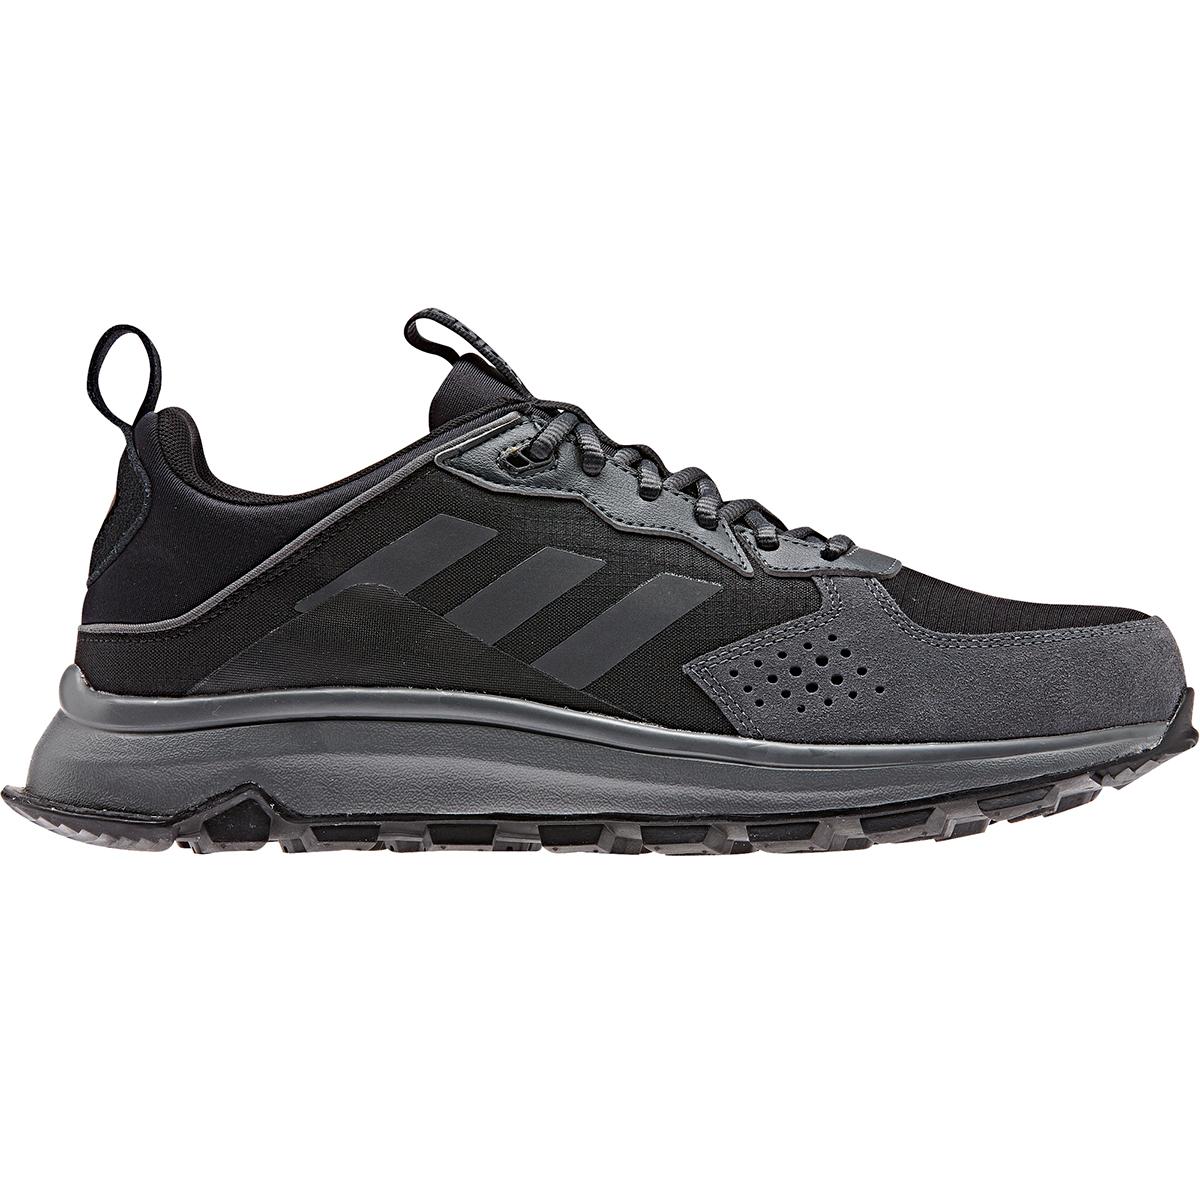 Adidas Men's Response Trail Running Shoe, Wide - White, 13